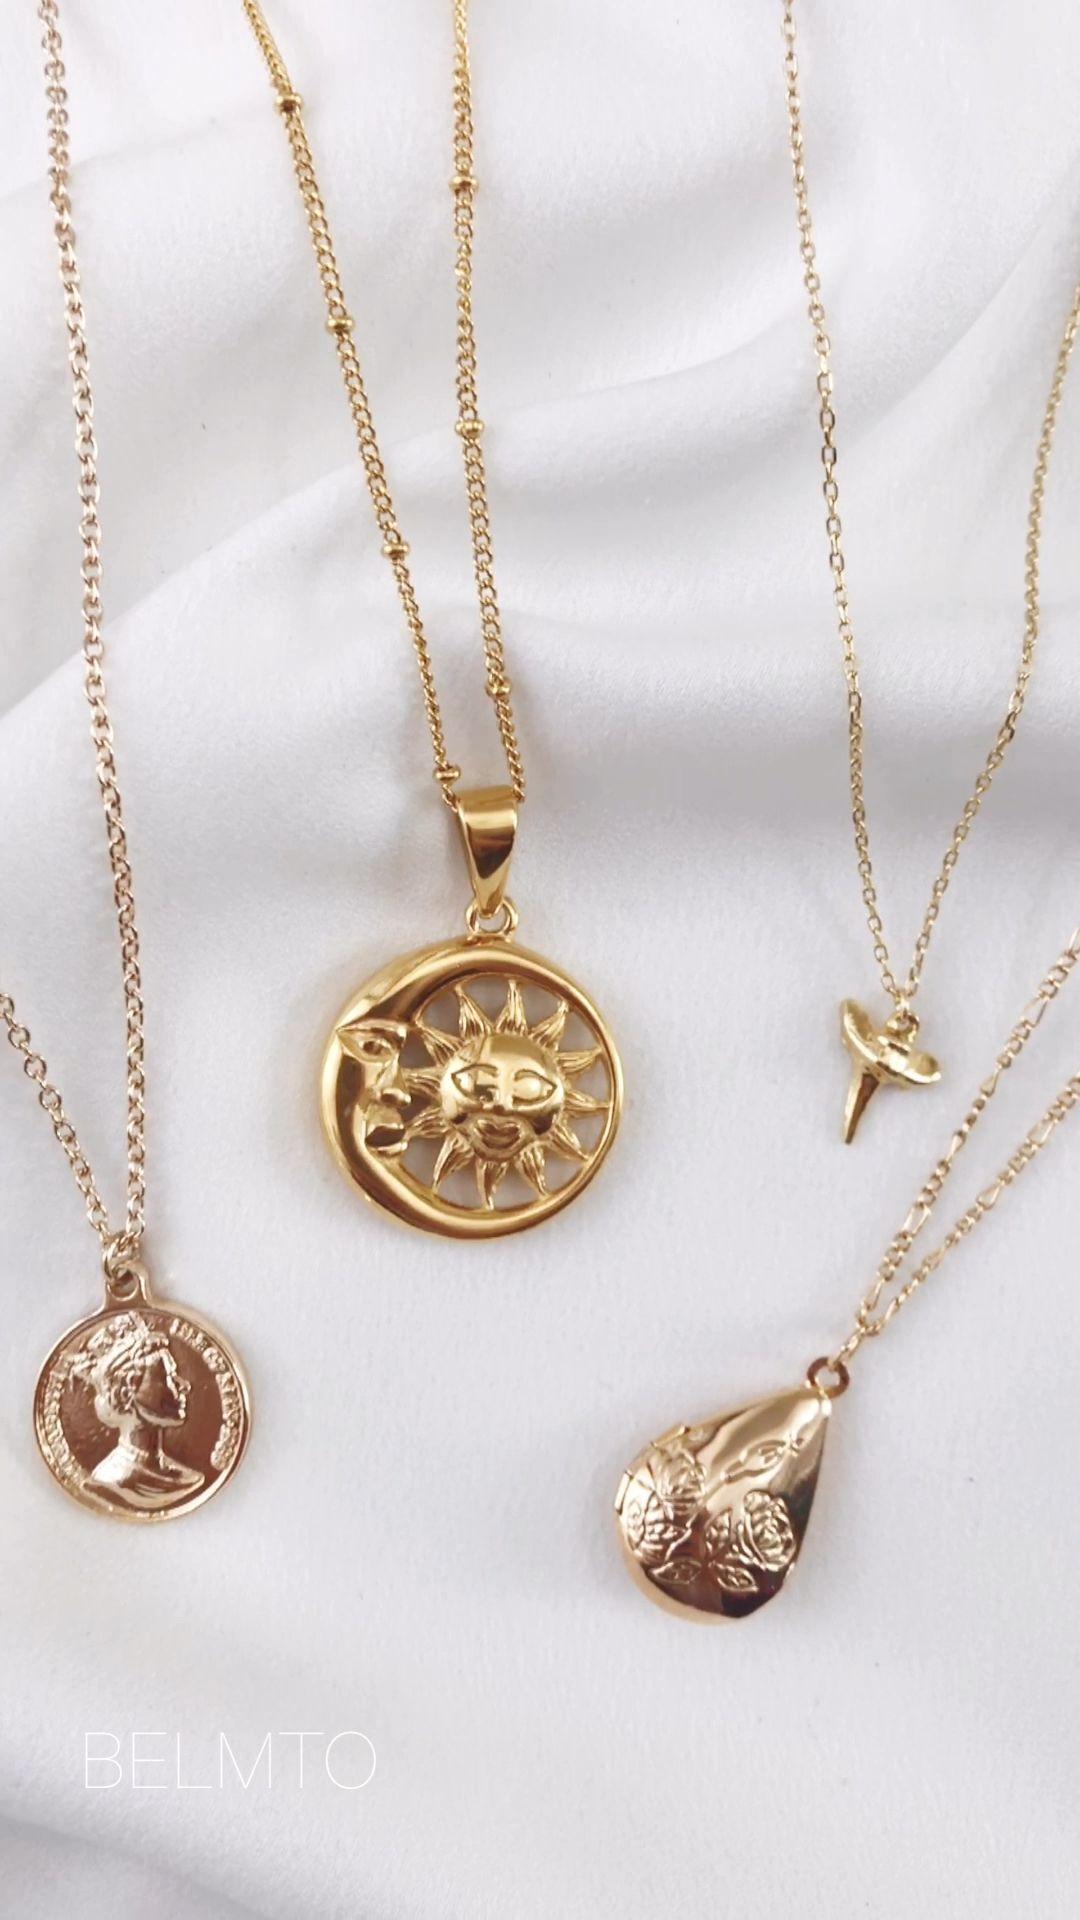 #minimalistjewelry #goldjewelry #style #fashion